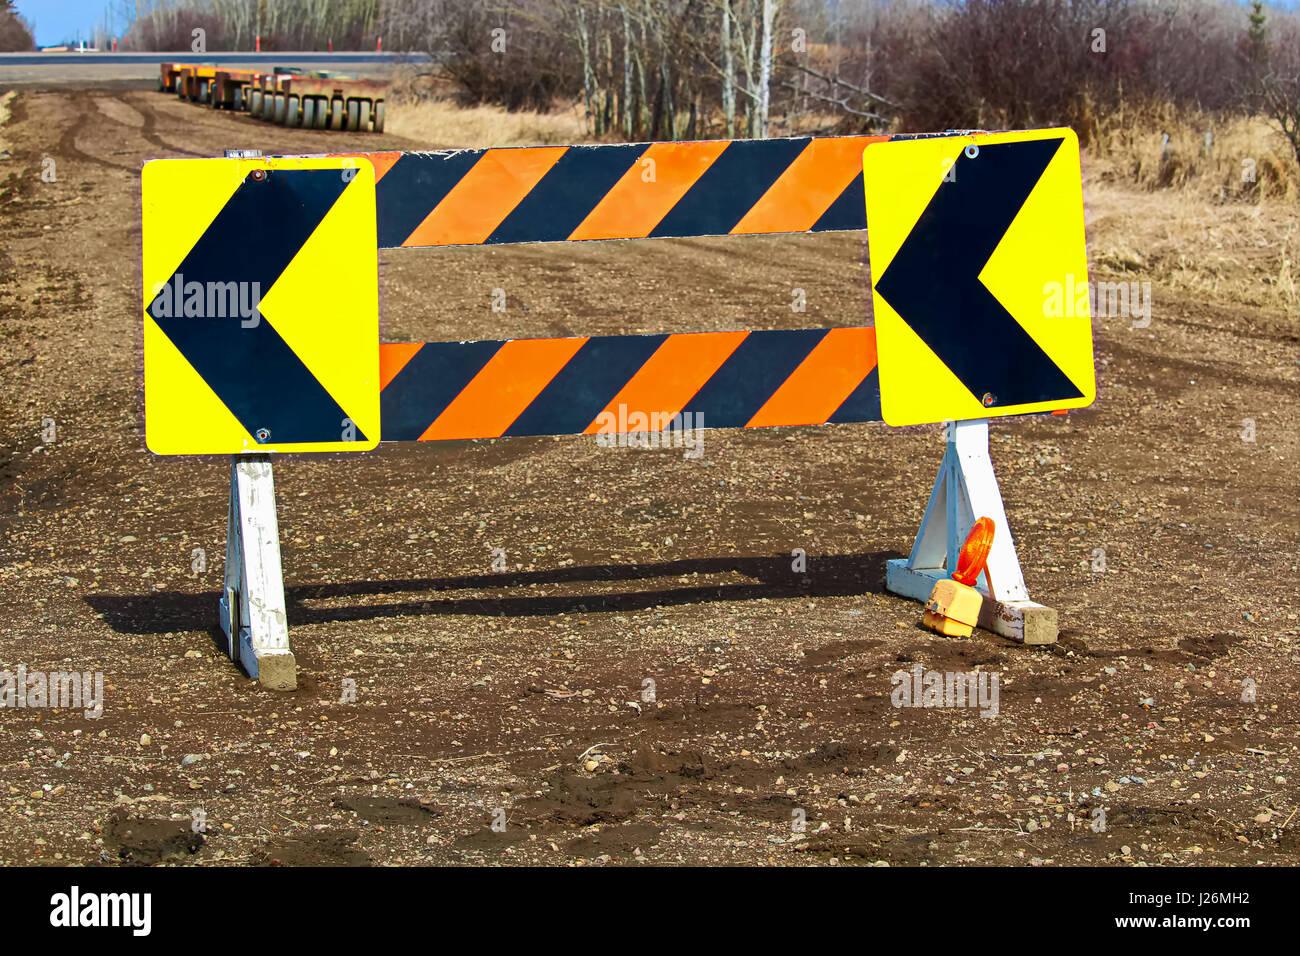 Detour construction barricade along a gravel road. - Stock Image